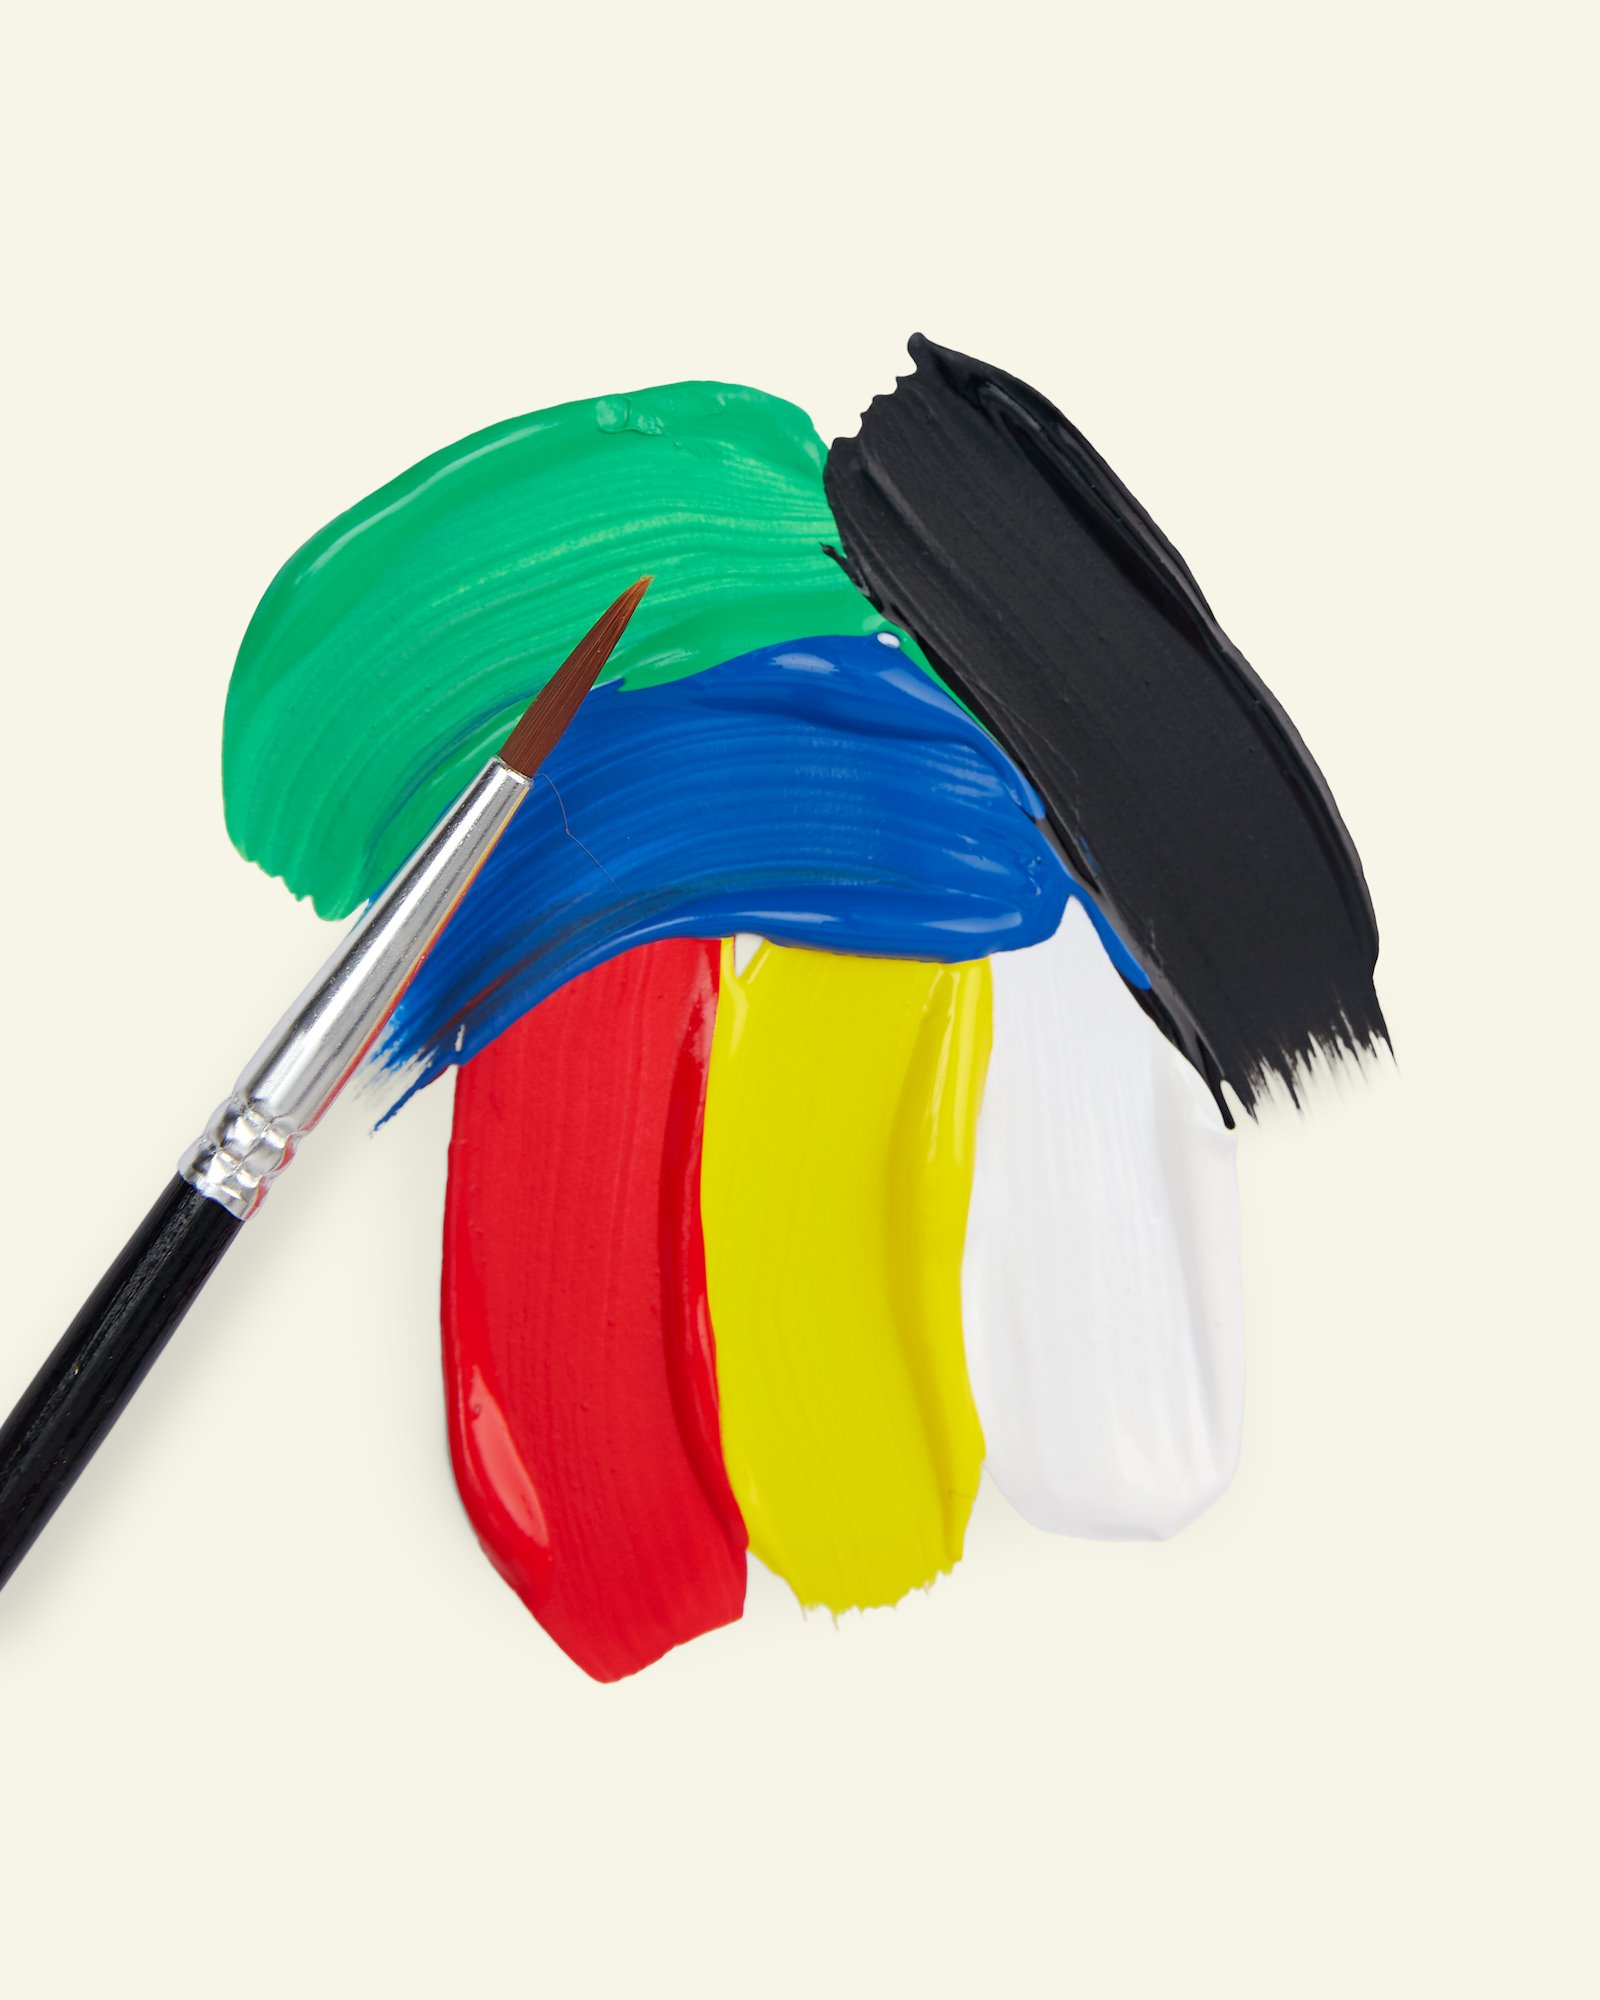 Javana opq fabric paints basic 6x20ml